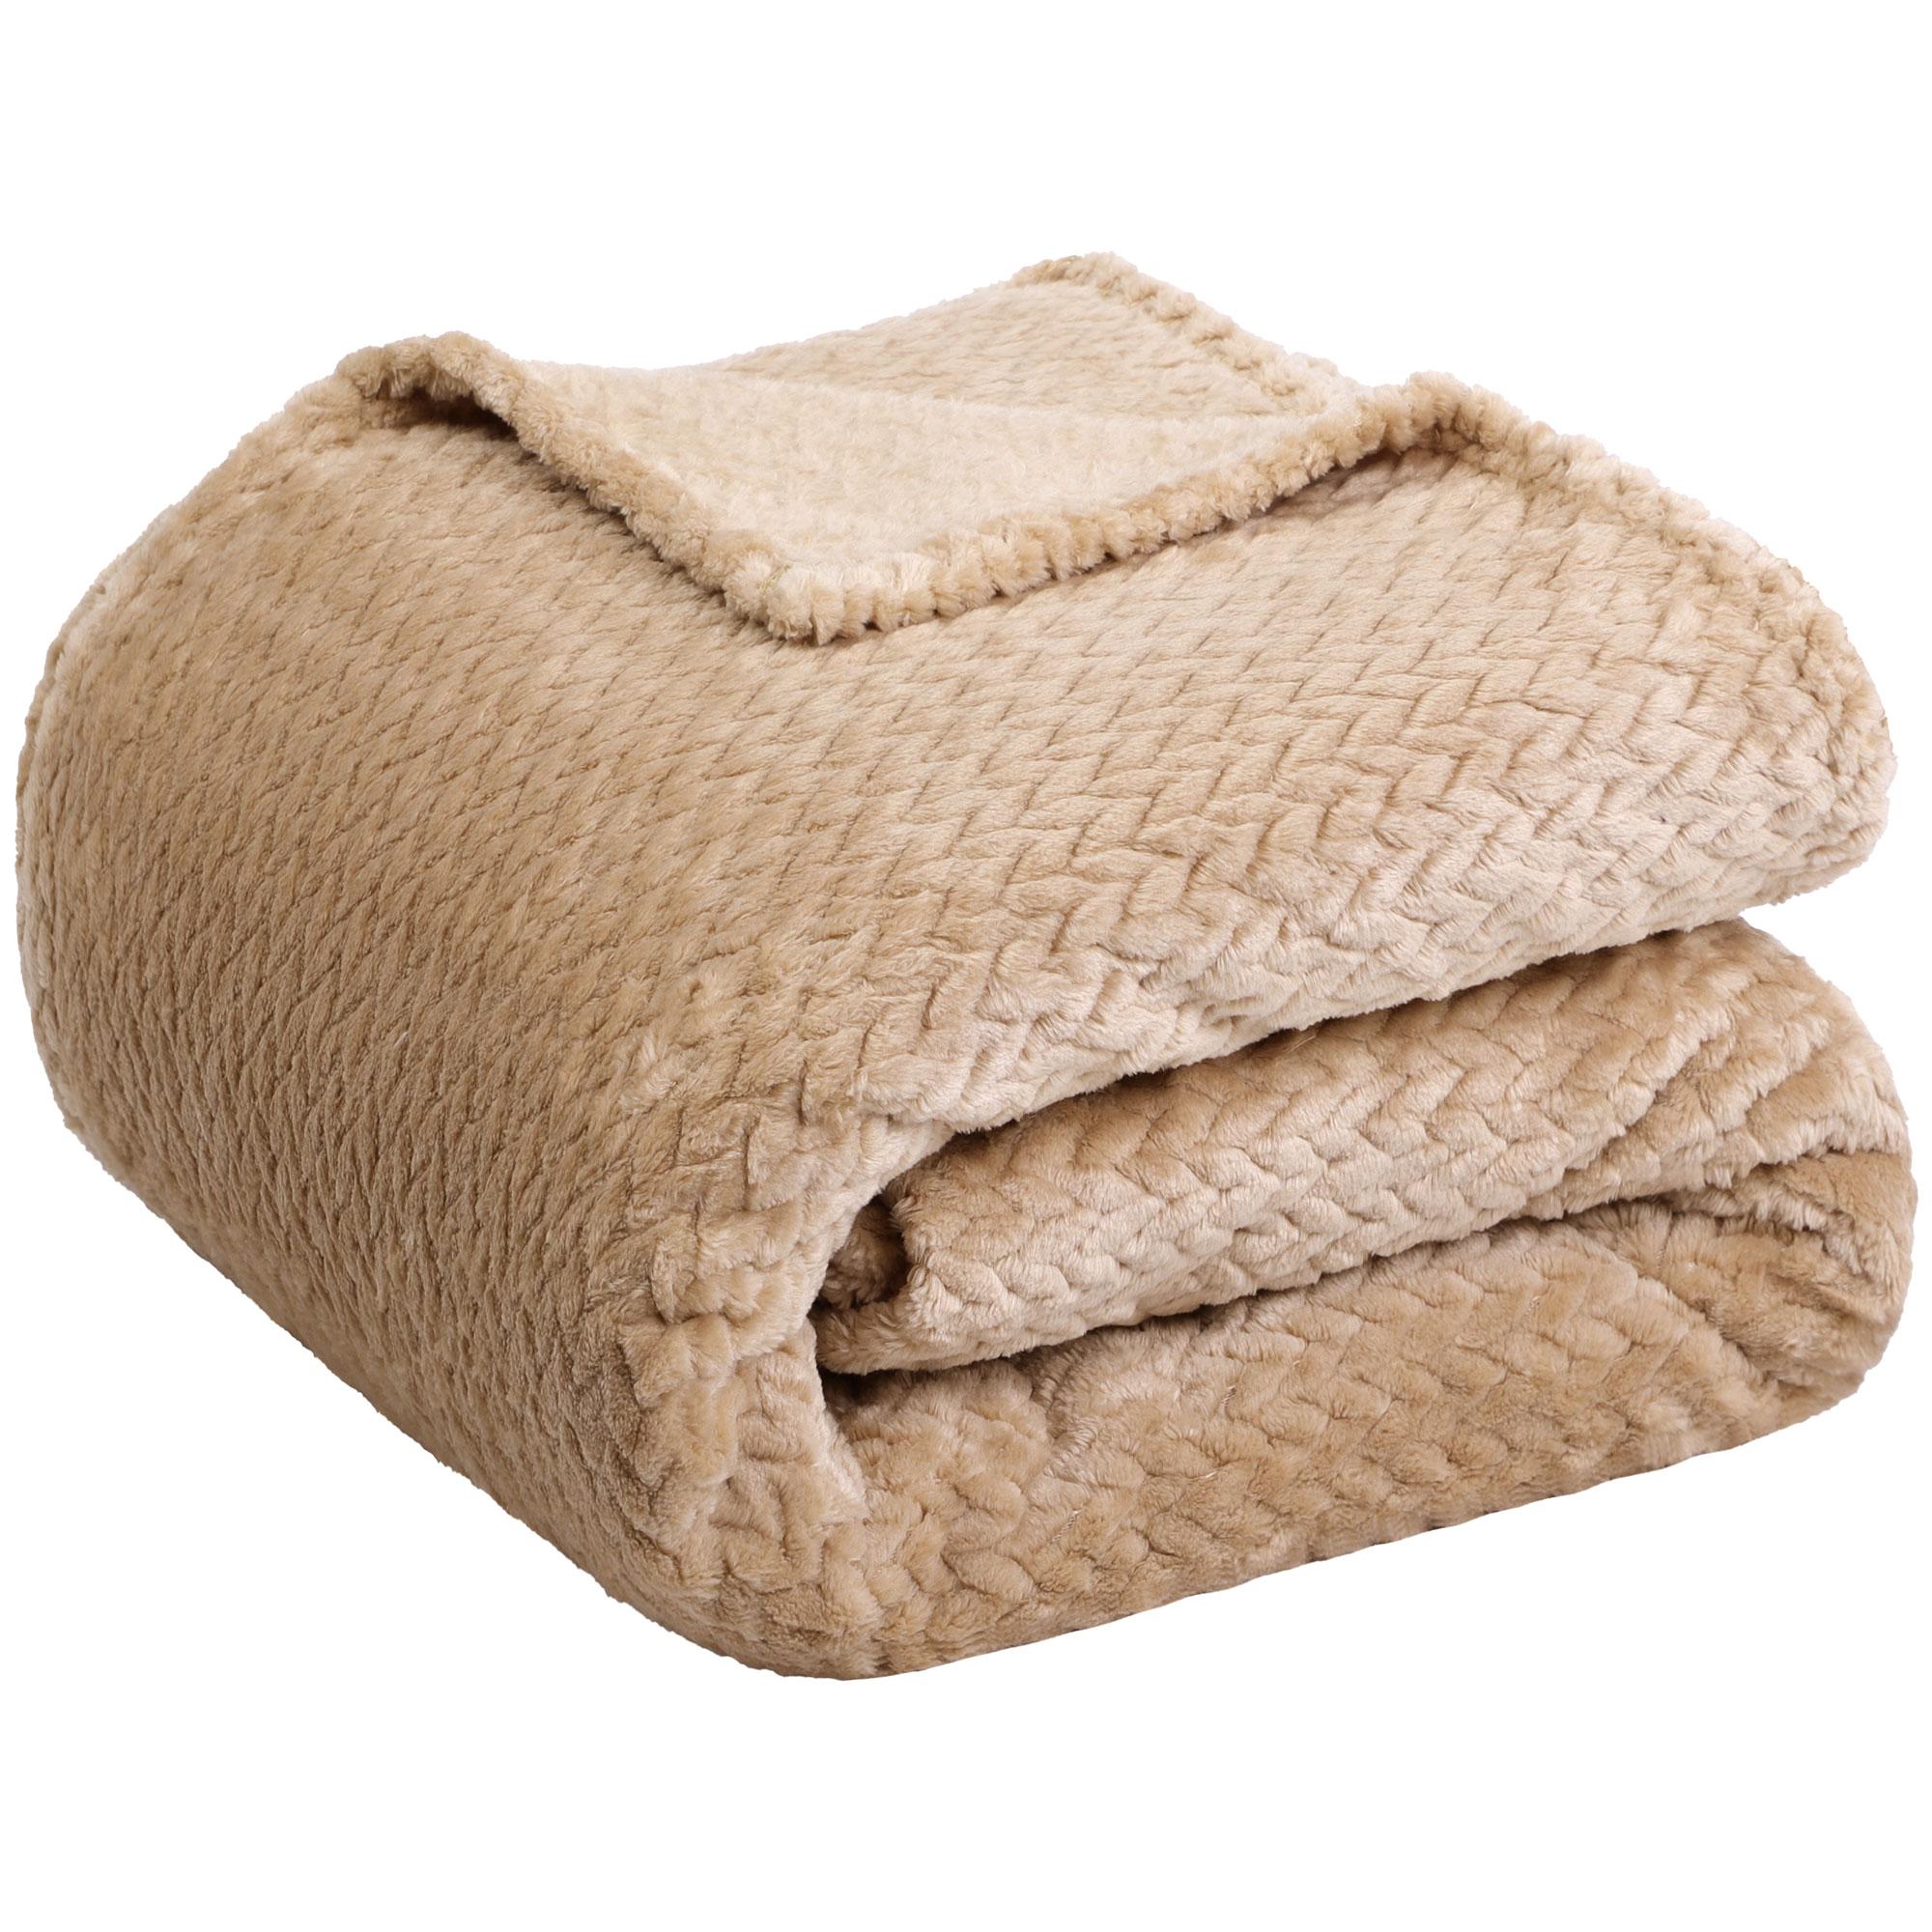 "New Luxury Leaves Queens Fleece Warm Large Sofa Blankets 78"" x 90"" Light Brown"